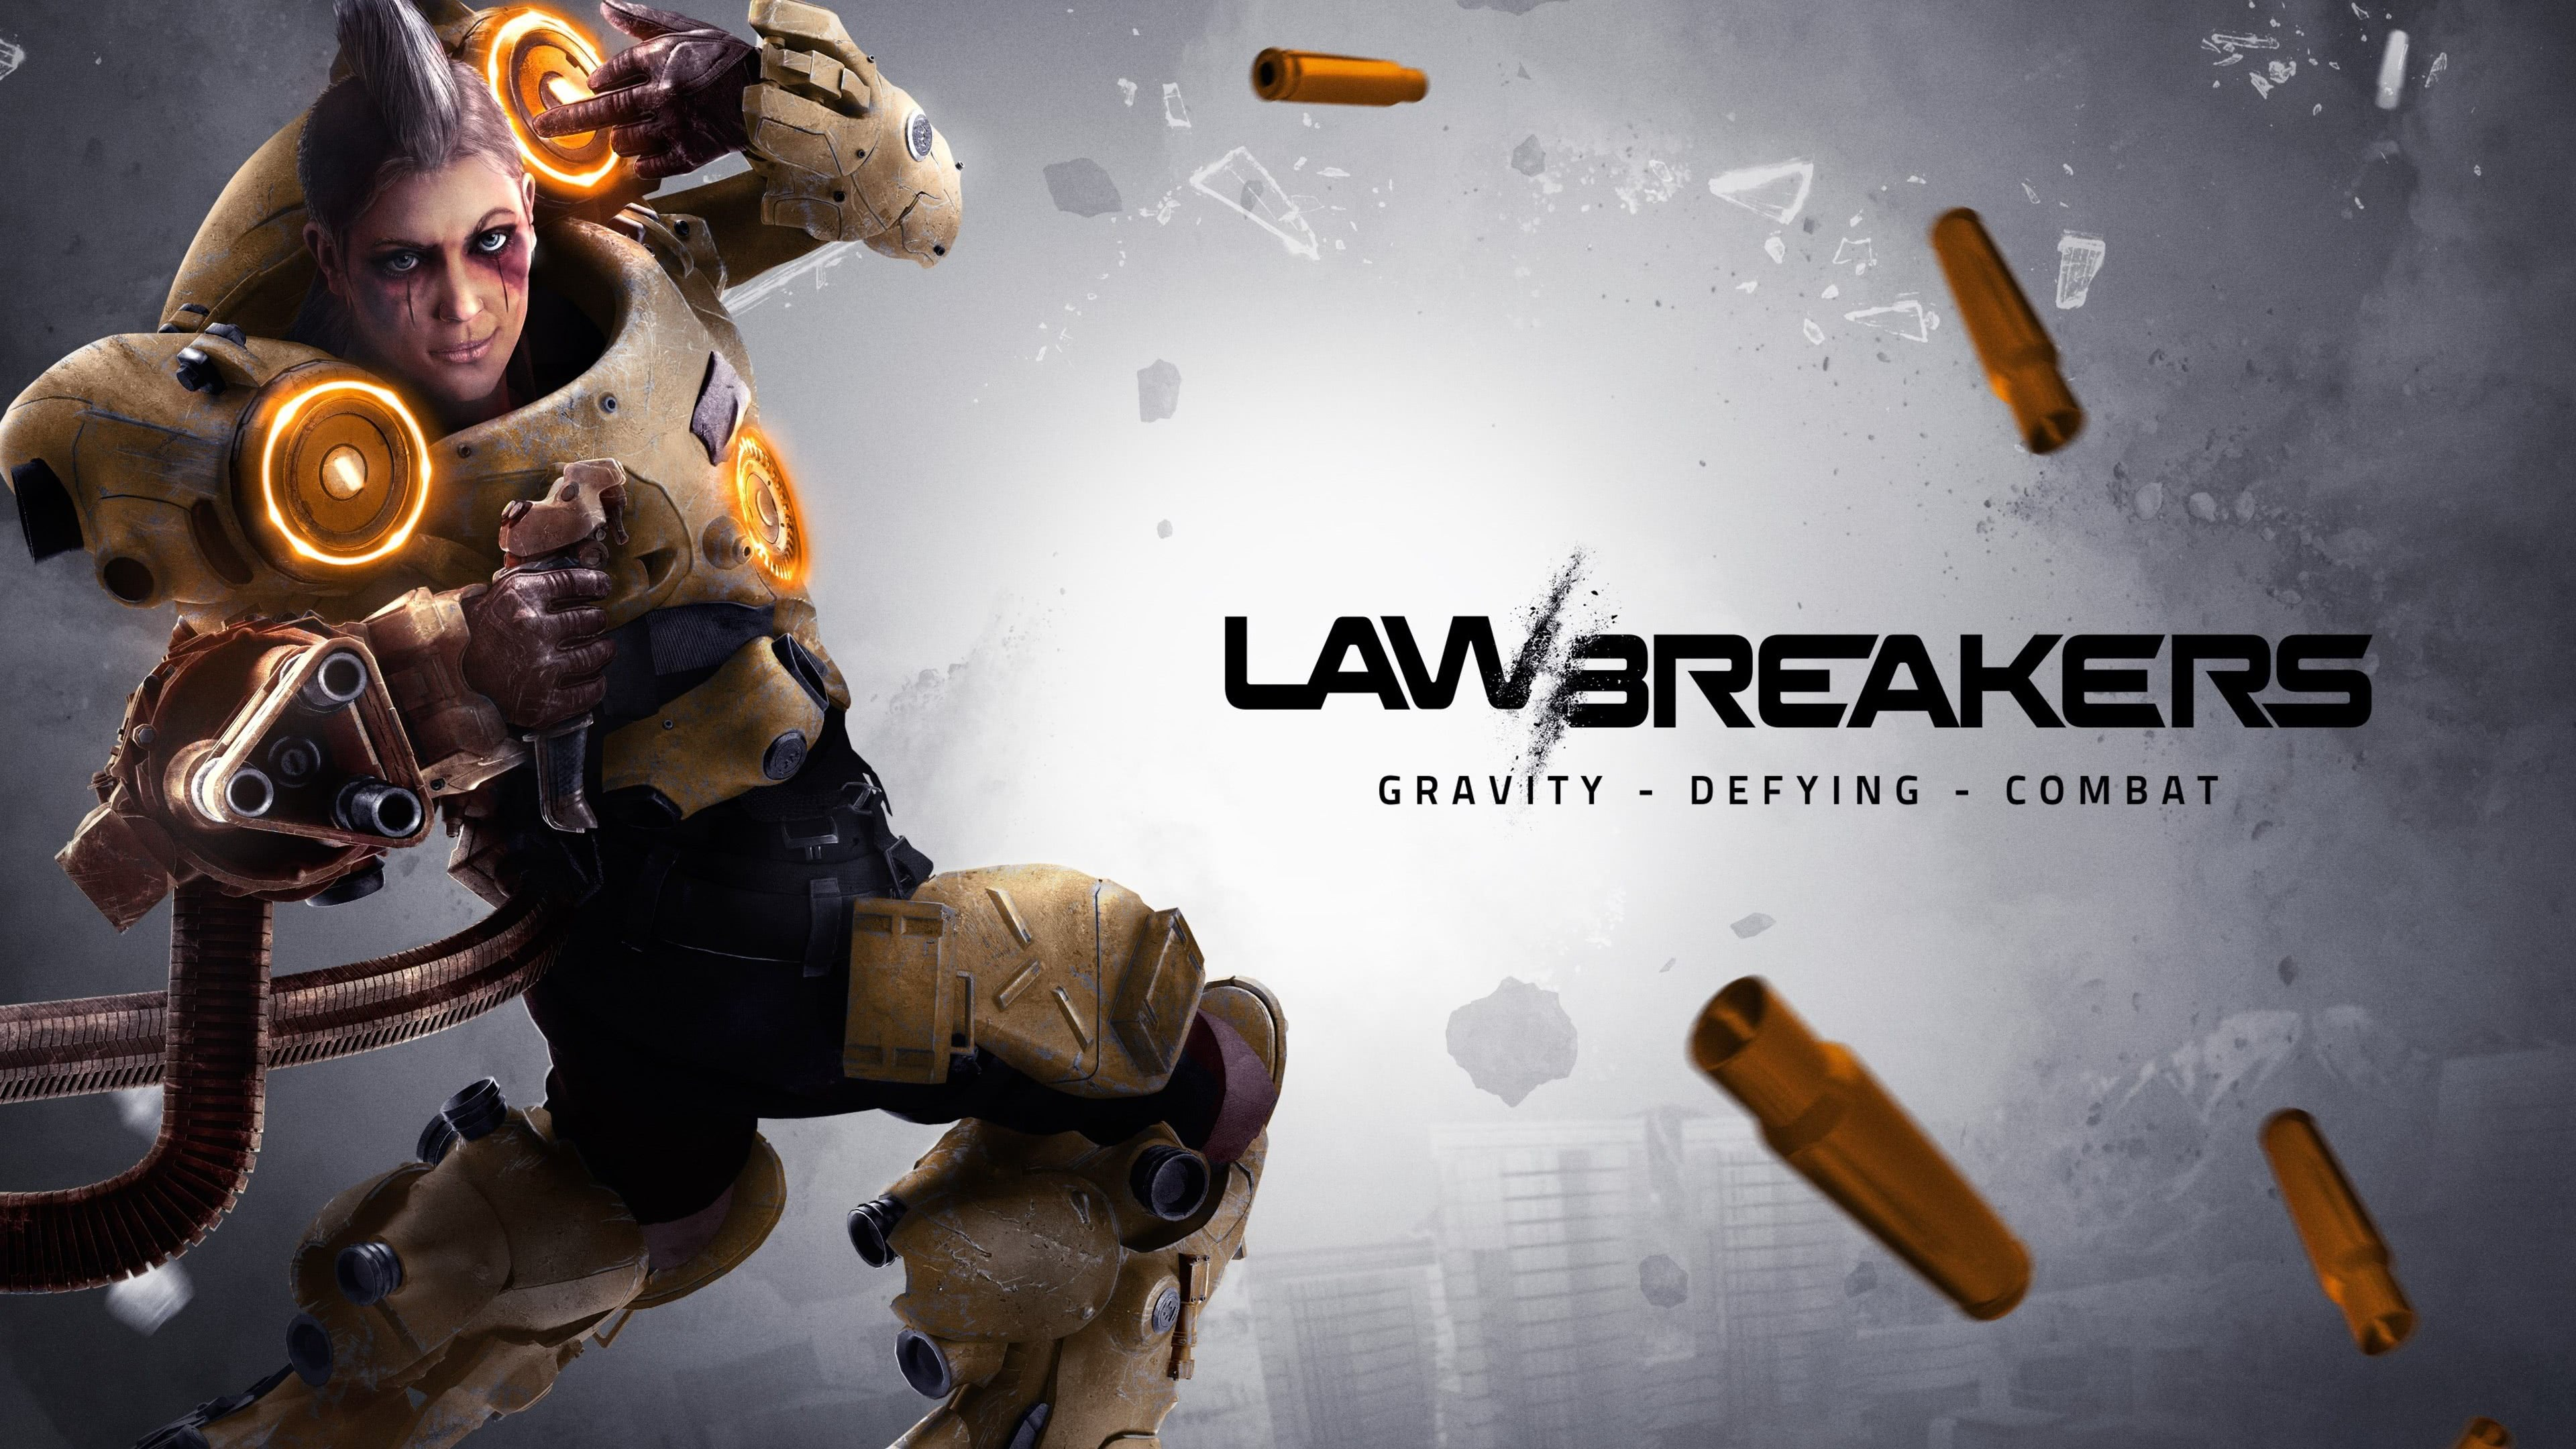 lawbreakers toska uhd 4k wallpaper